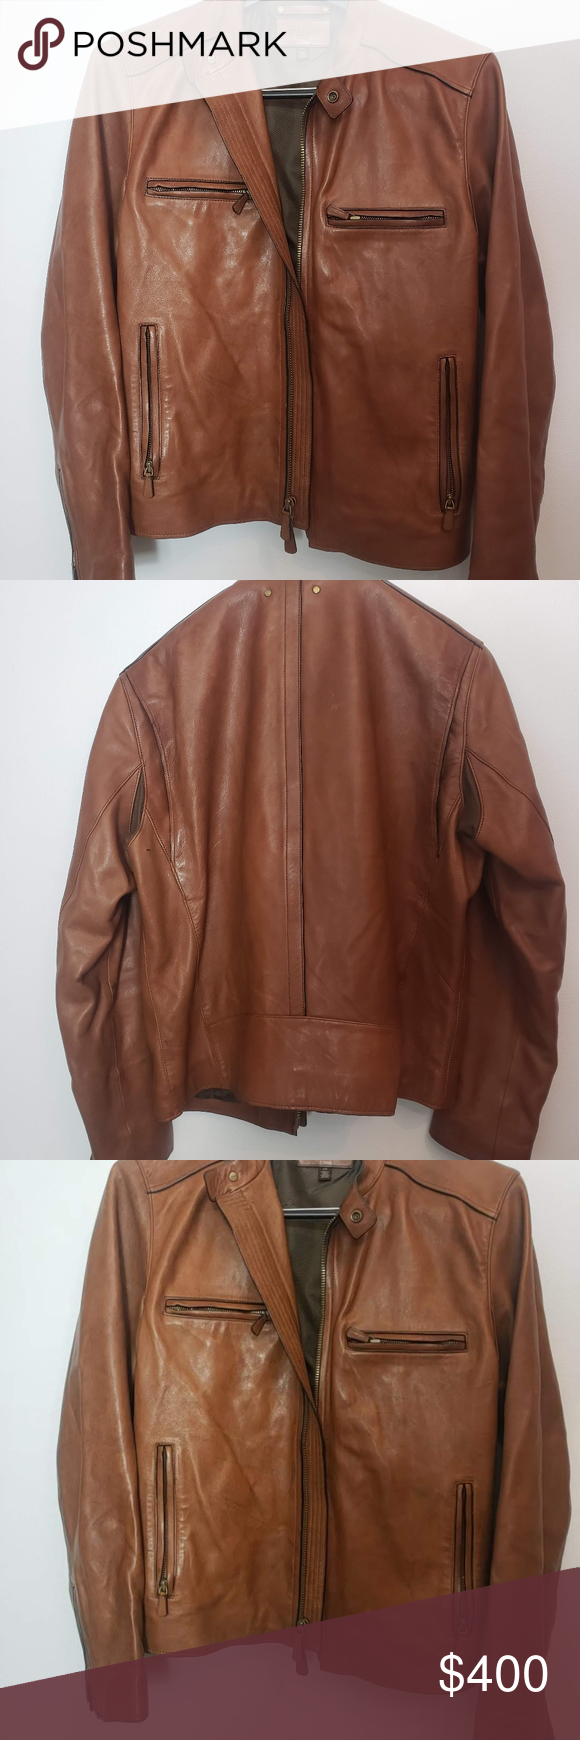 Coach Bleecker Leather Racer 82781 Size US L Retail 998